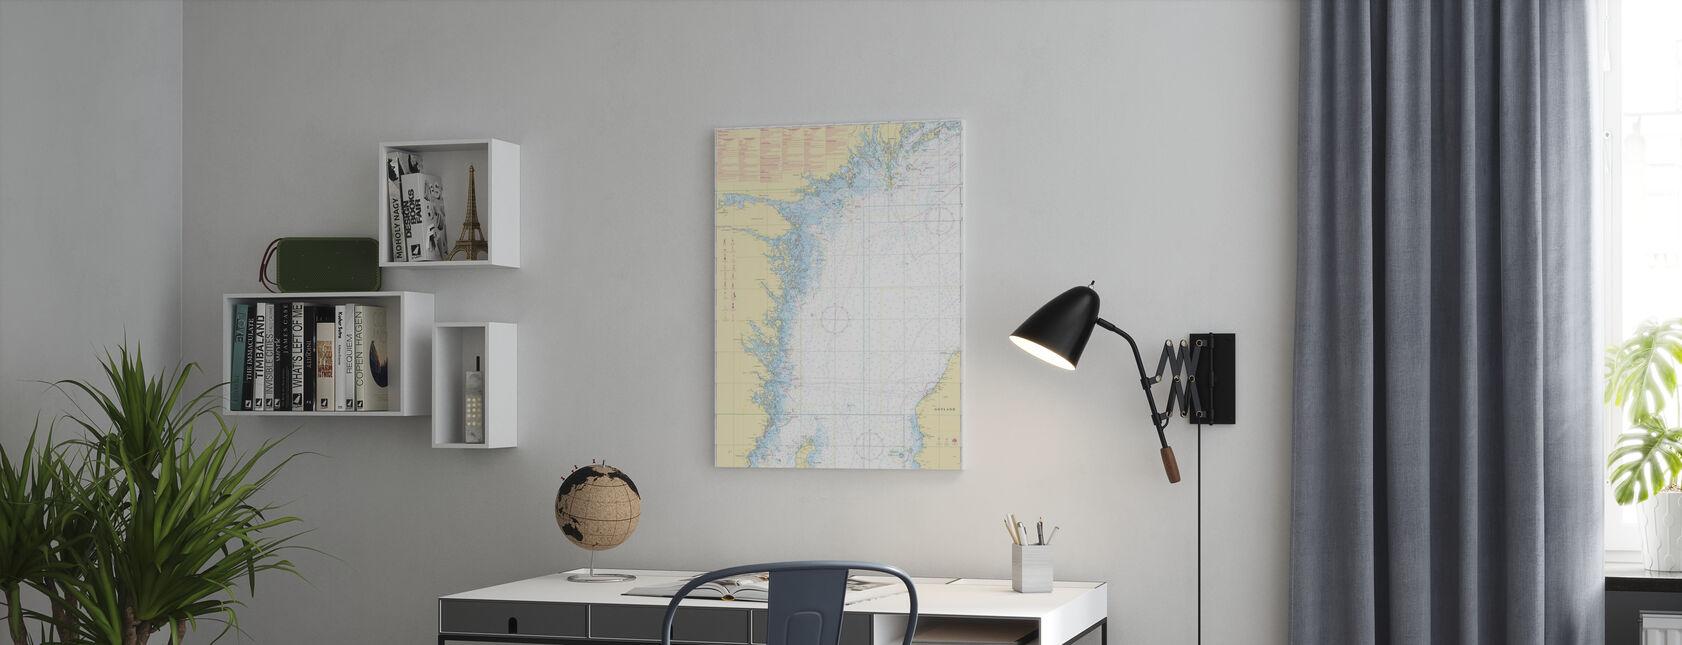 Zeekaart 72 - Oland - Landsort - Canvas print - Kantoor